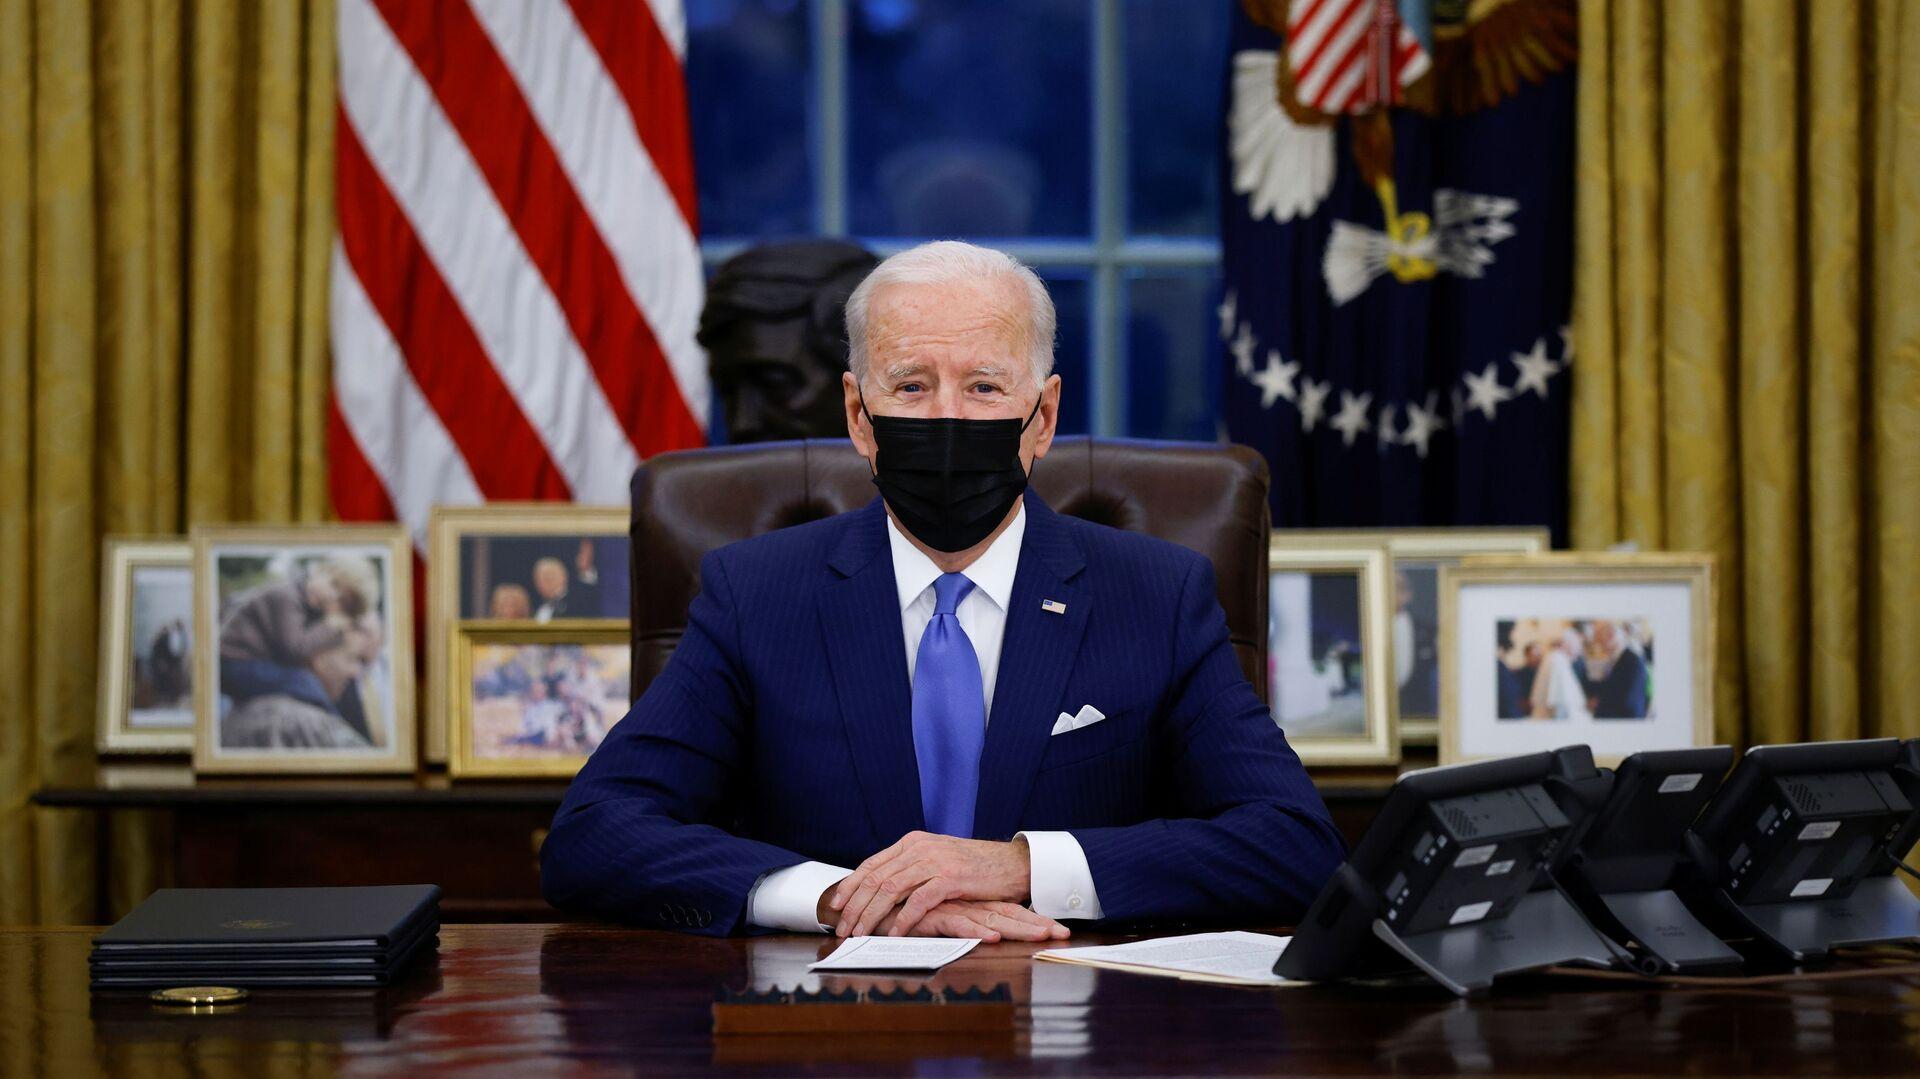 Joe Biden, presidente de EEUU - Sputnik Mundo, 1920, 02.02.2021